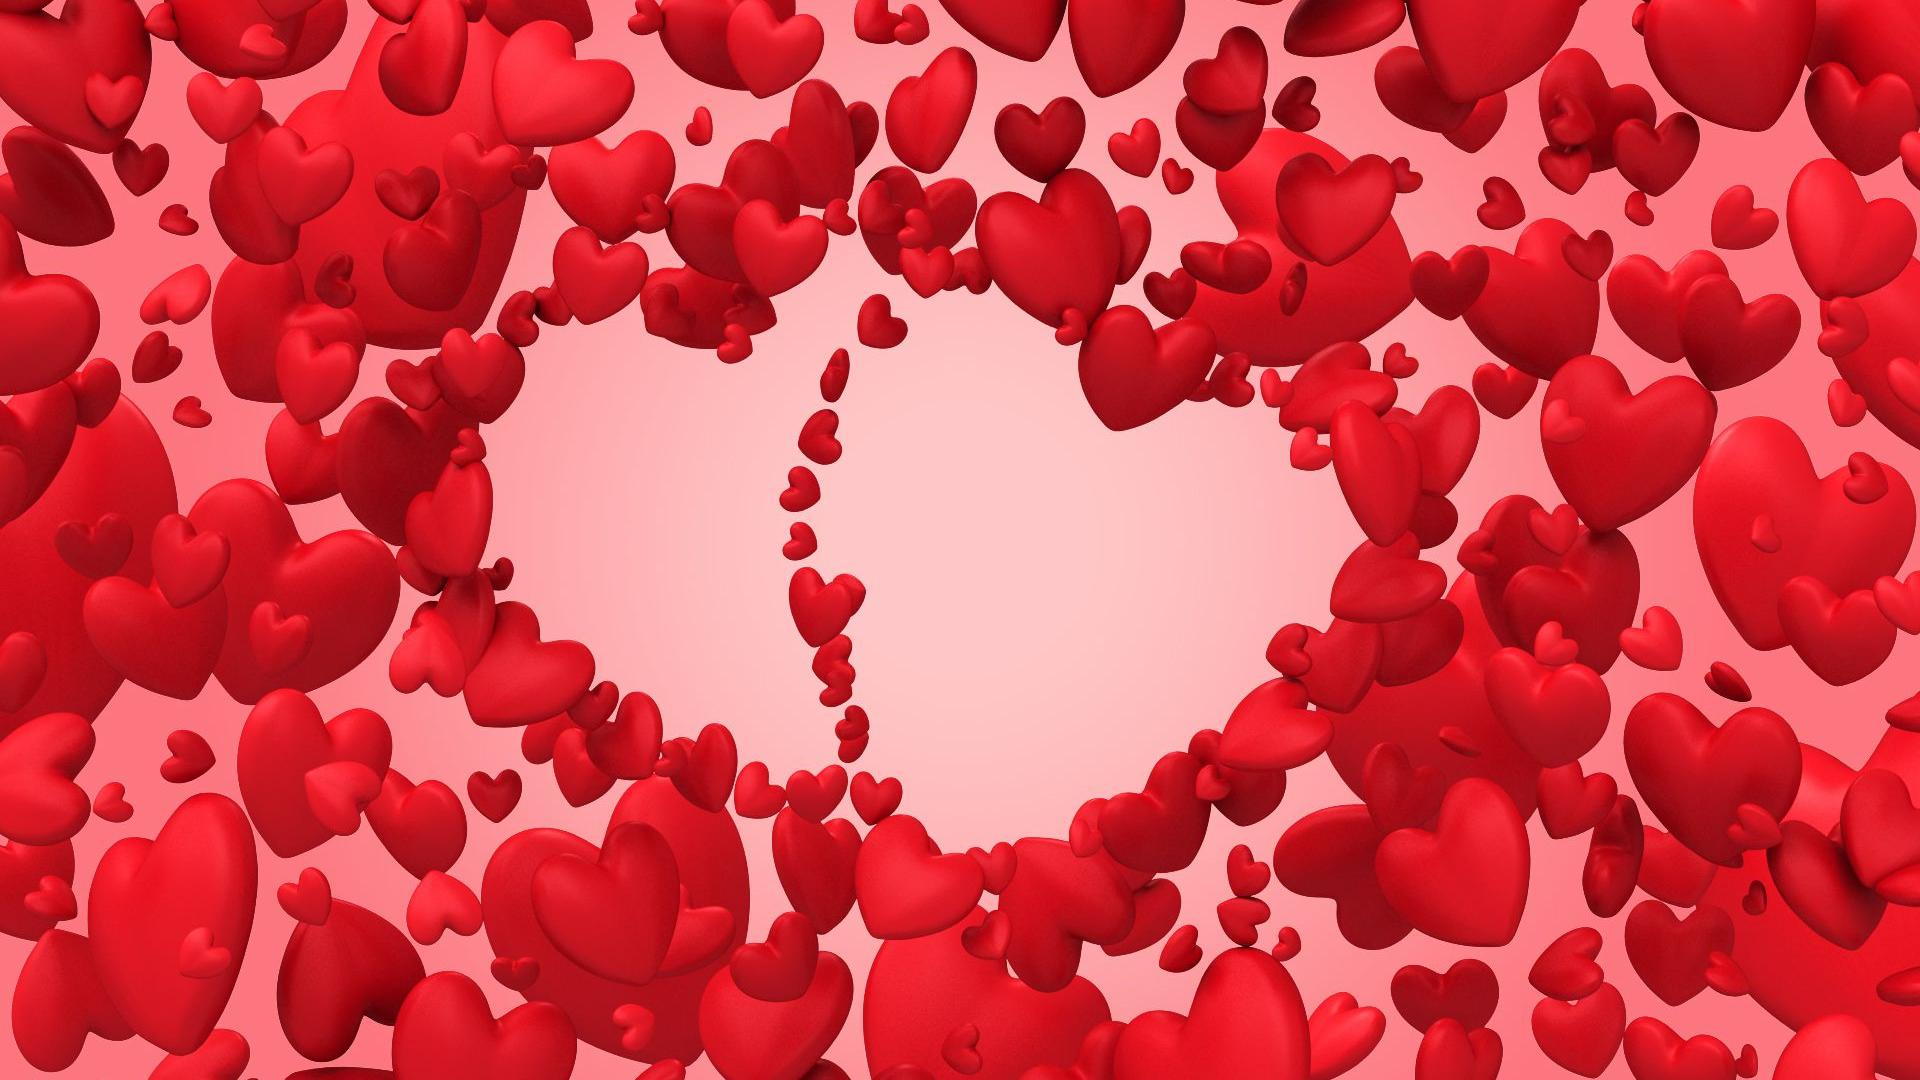 Valentines Day Background Hd 1920x1080